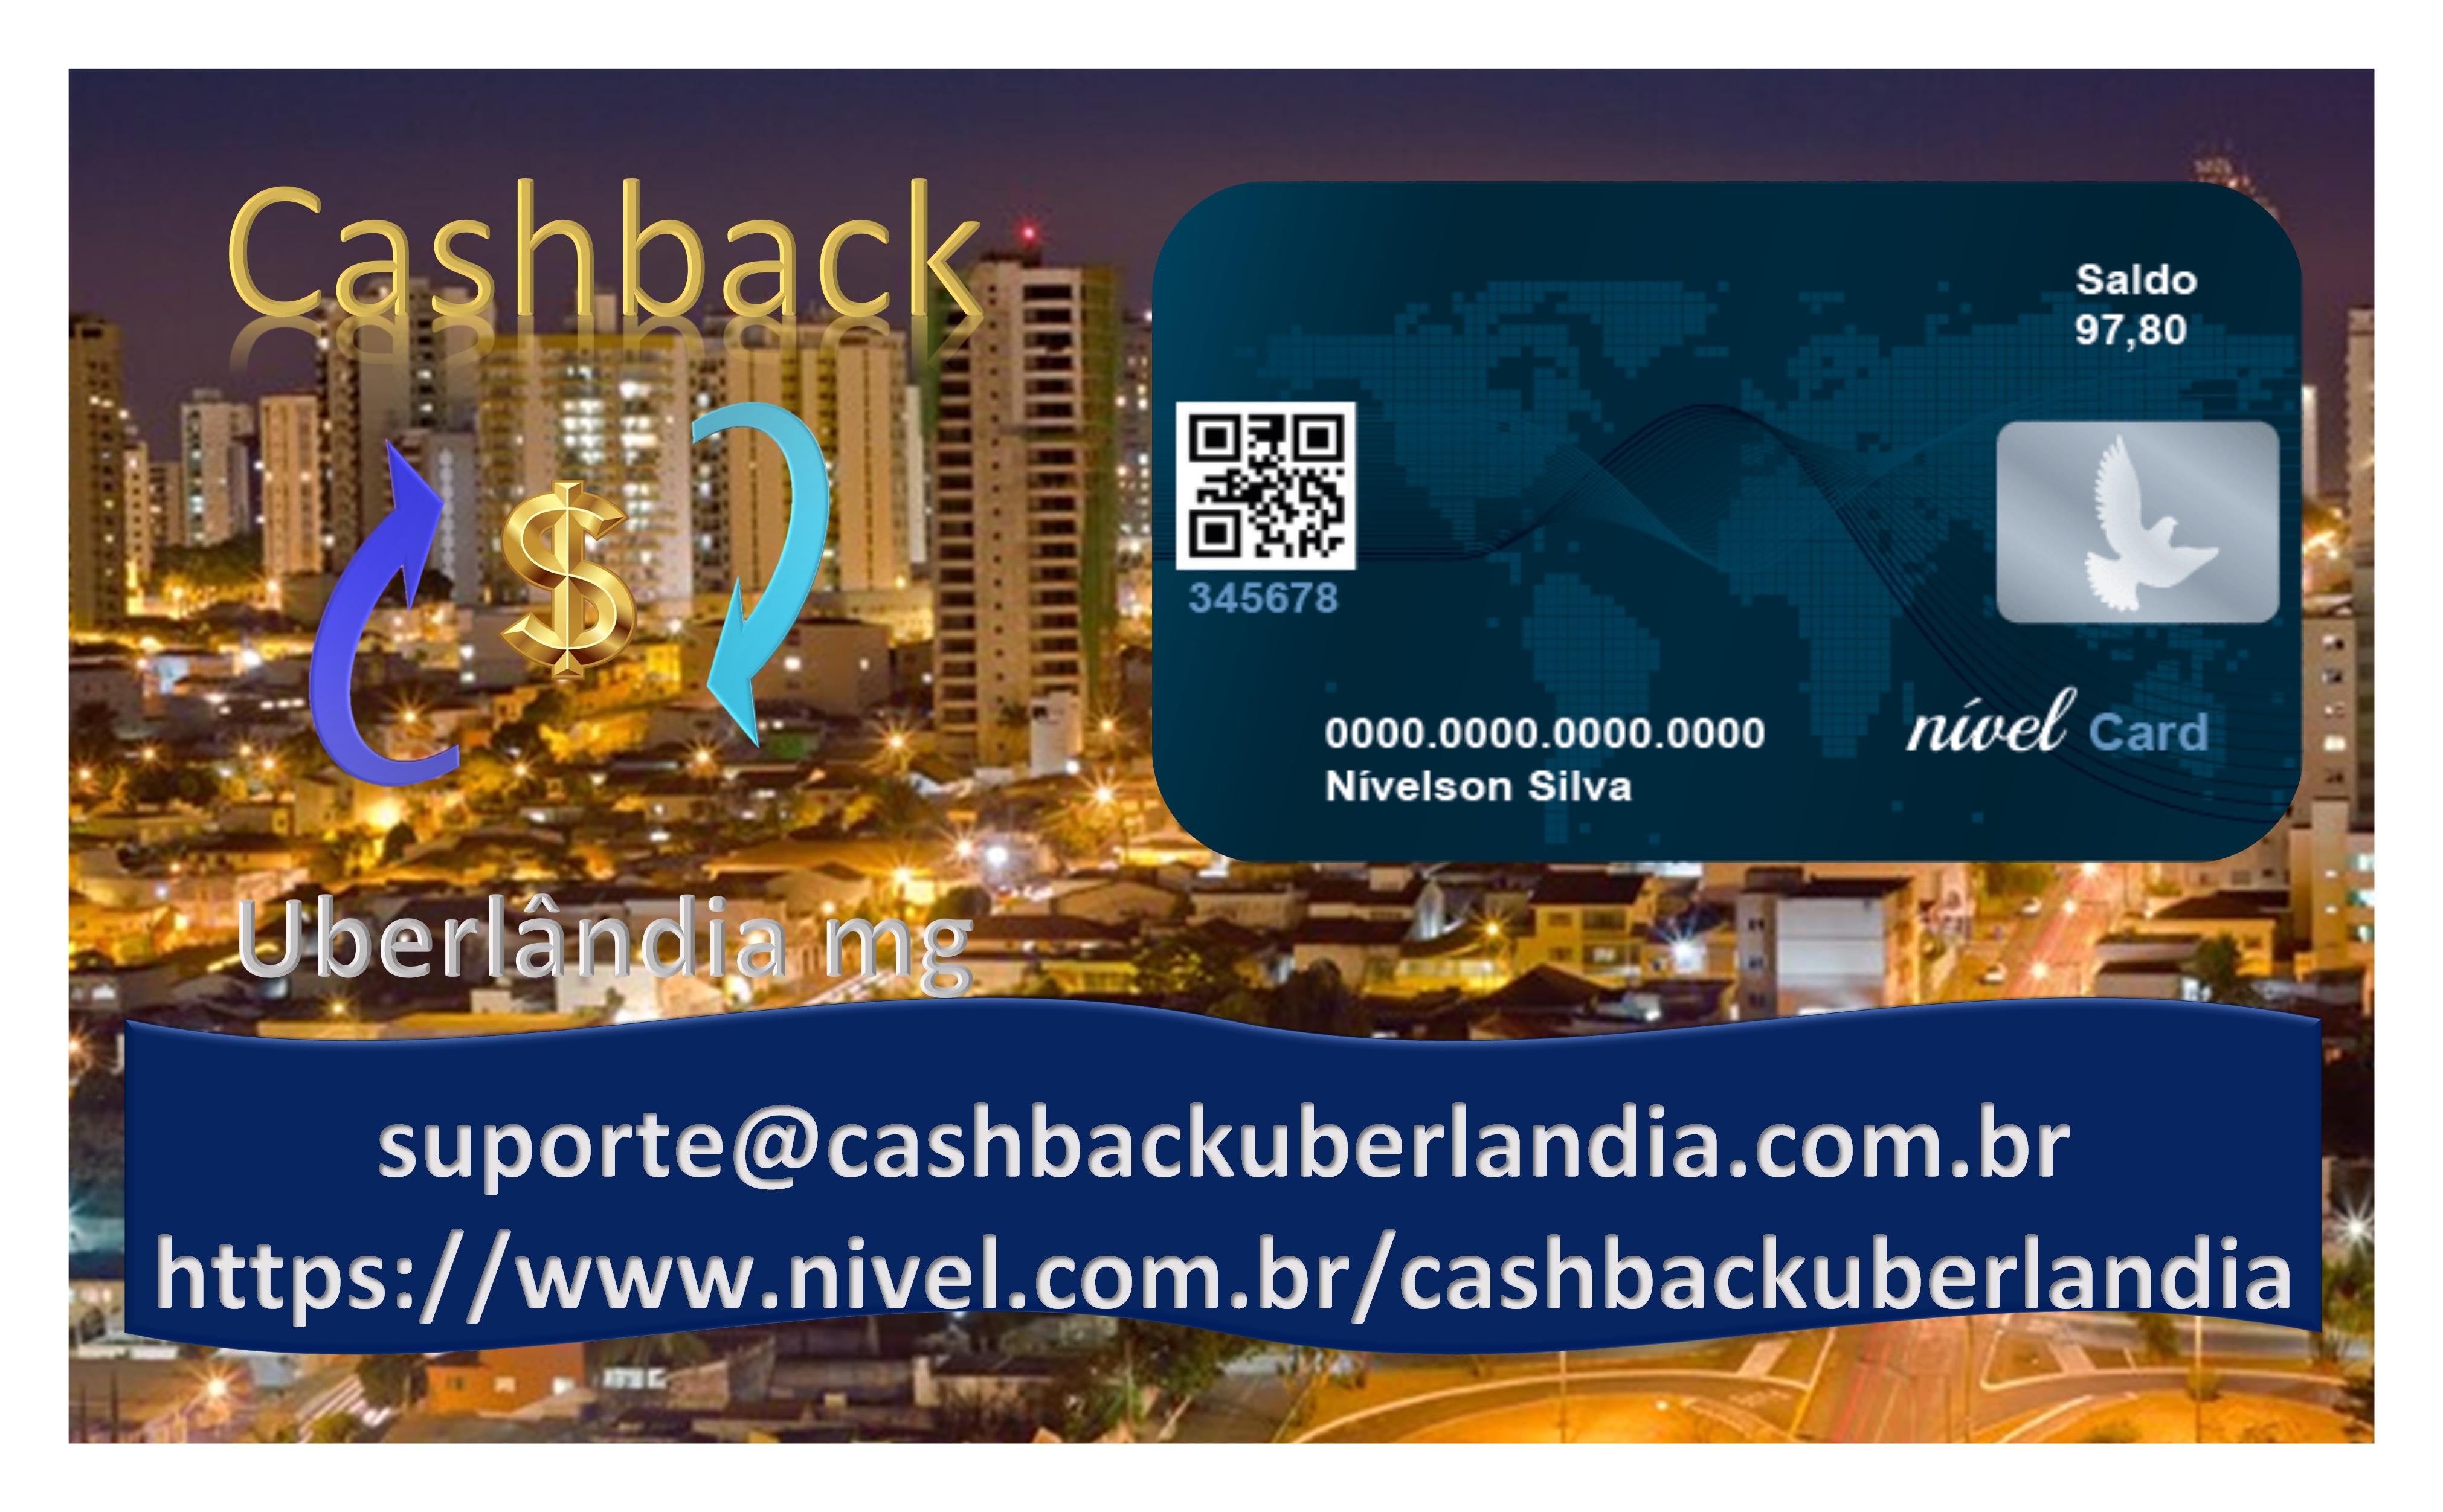 Cashback Uberlandia Marketng 2.7